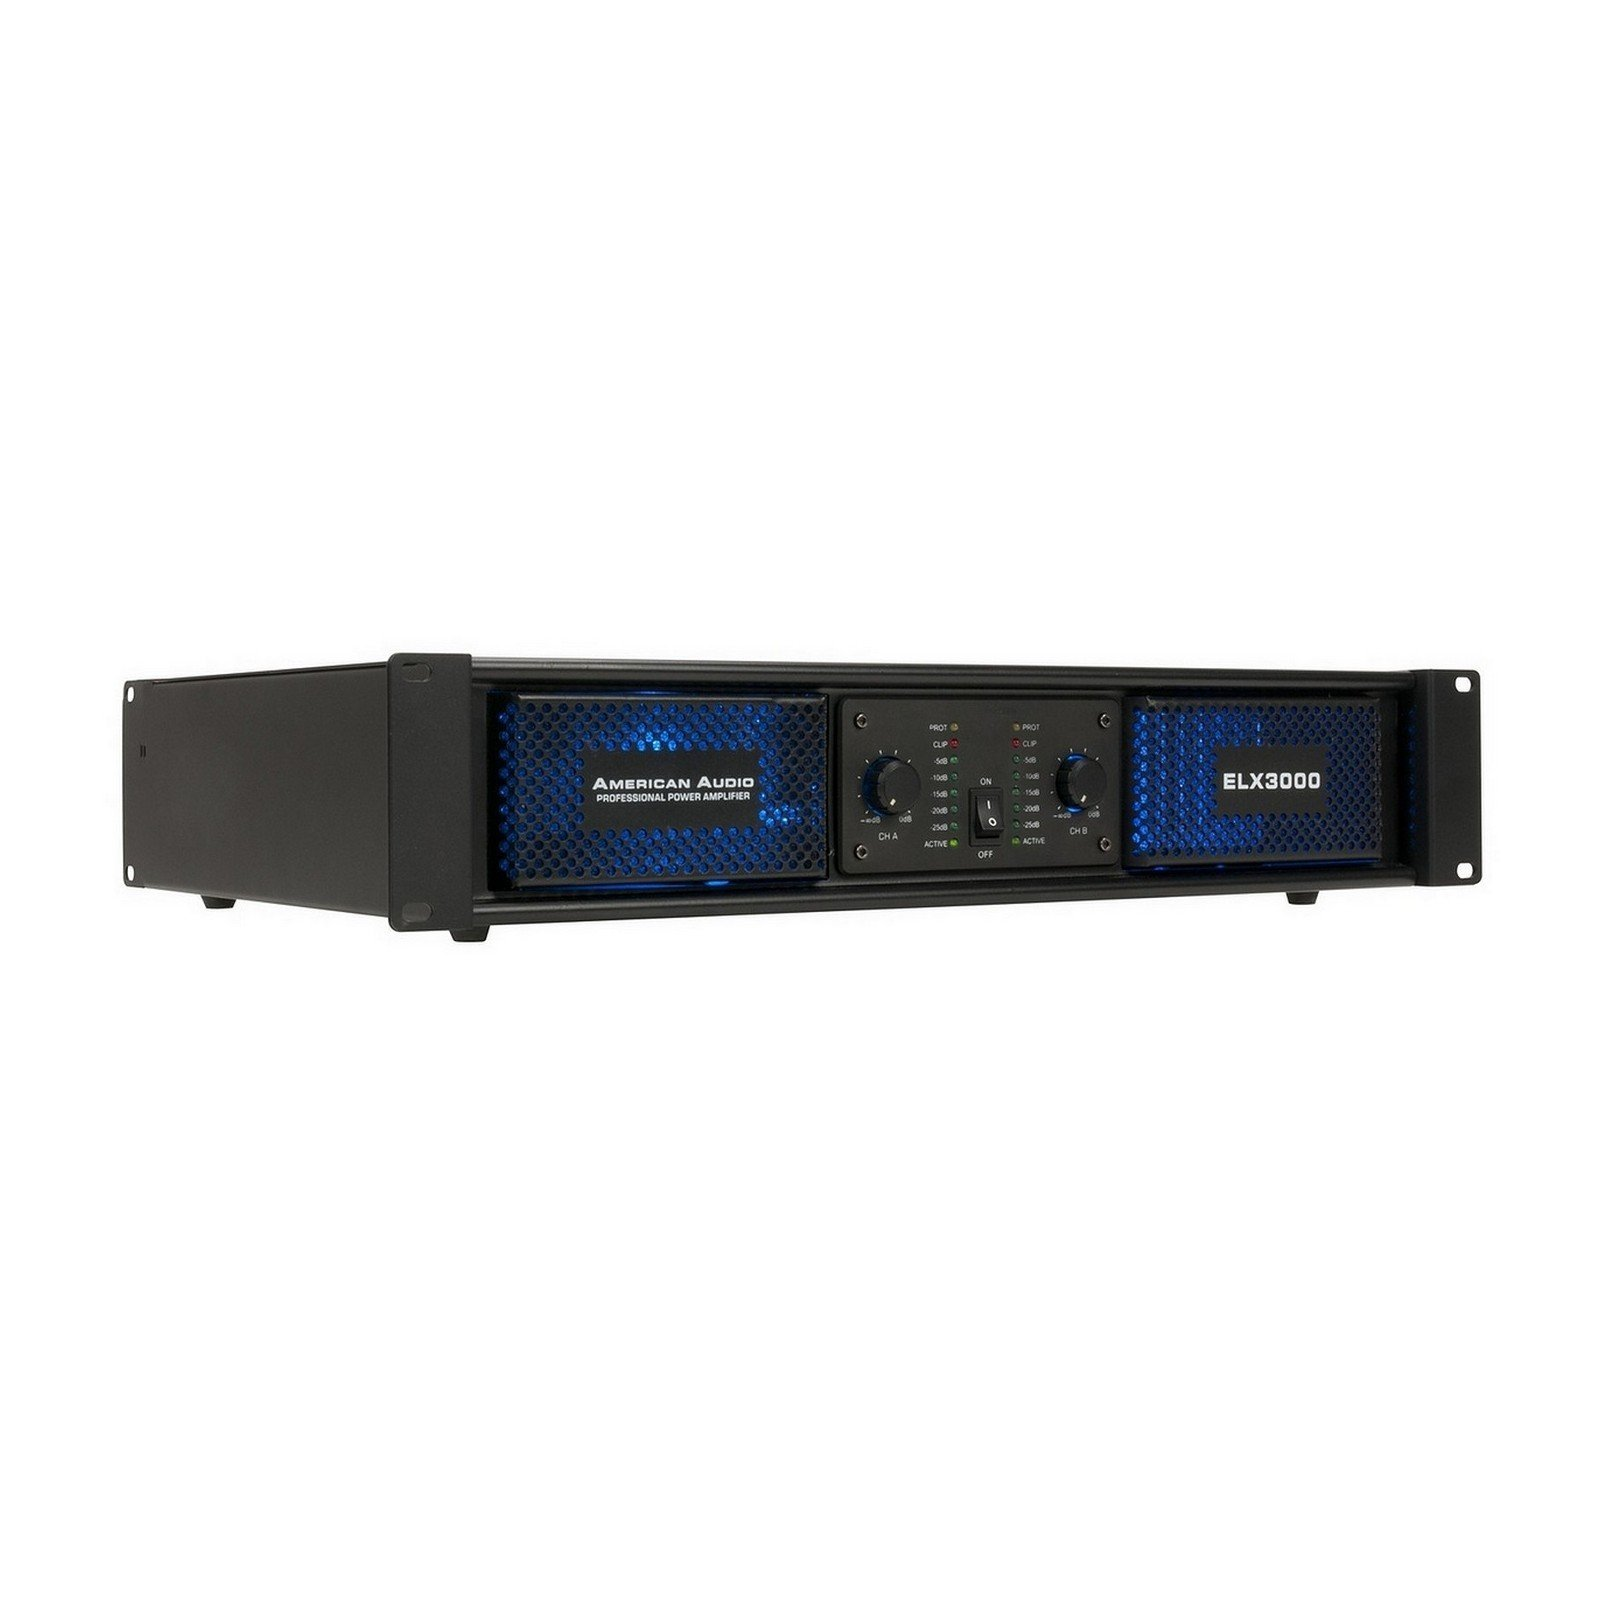 American Audio ELX3000 | 2x180W RMS Power Amplifier for DJ Venue